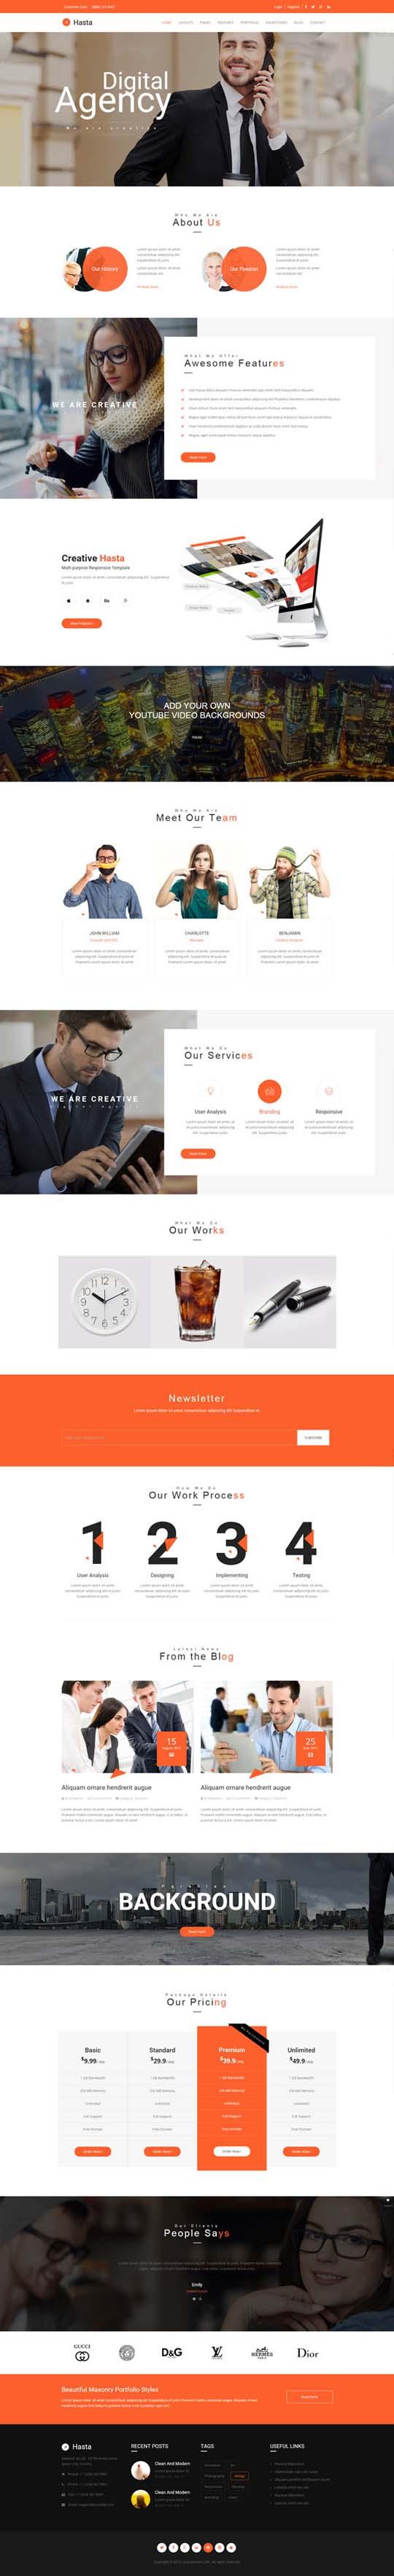 4.Responsive Design HTML5 Website Templates